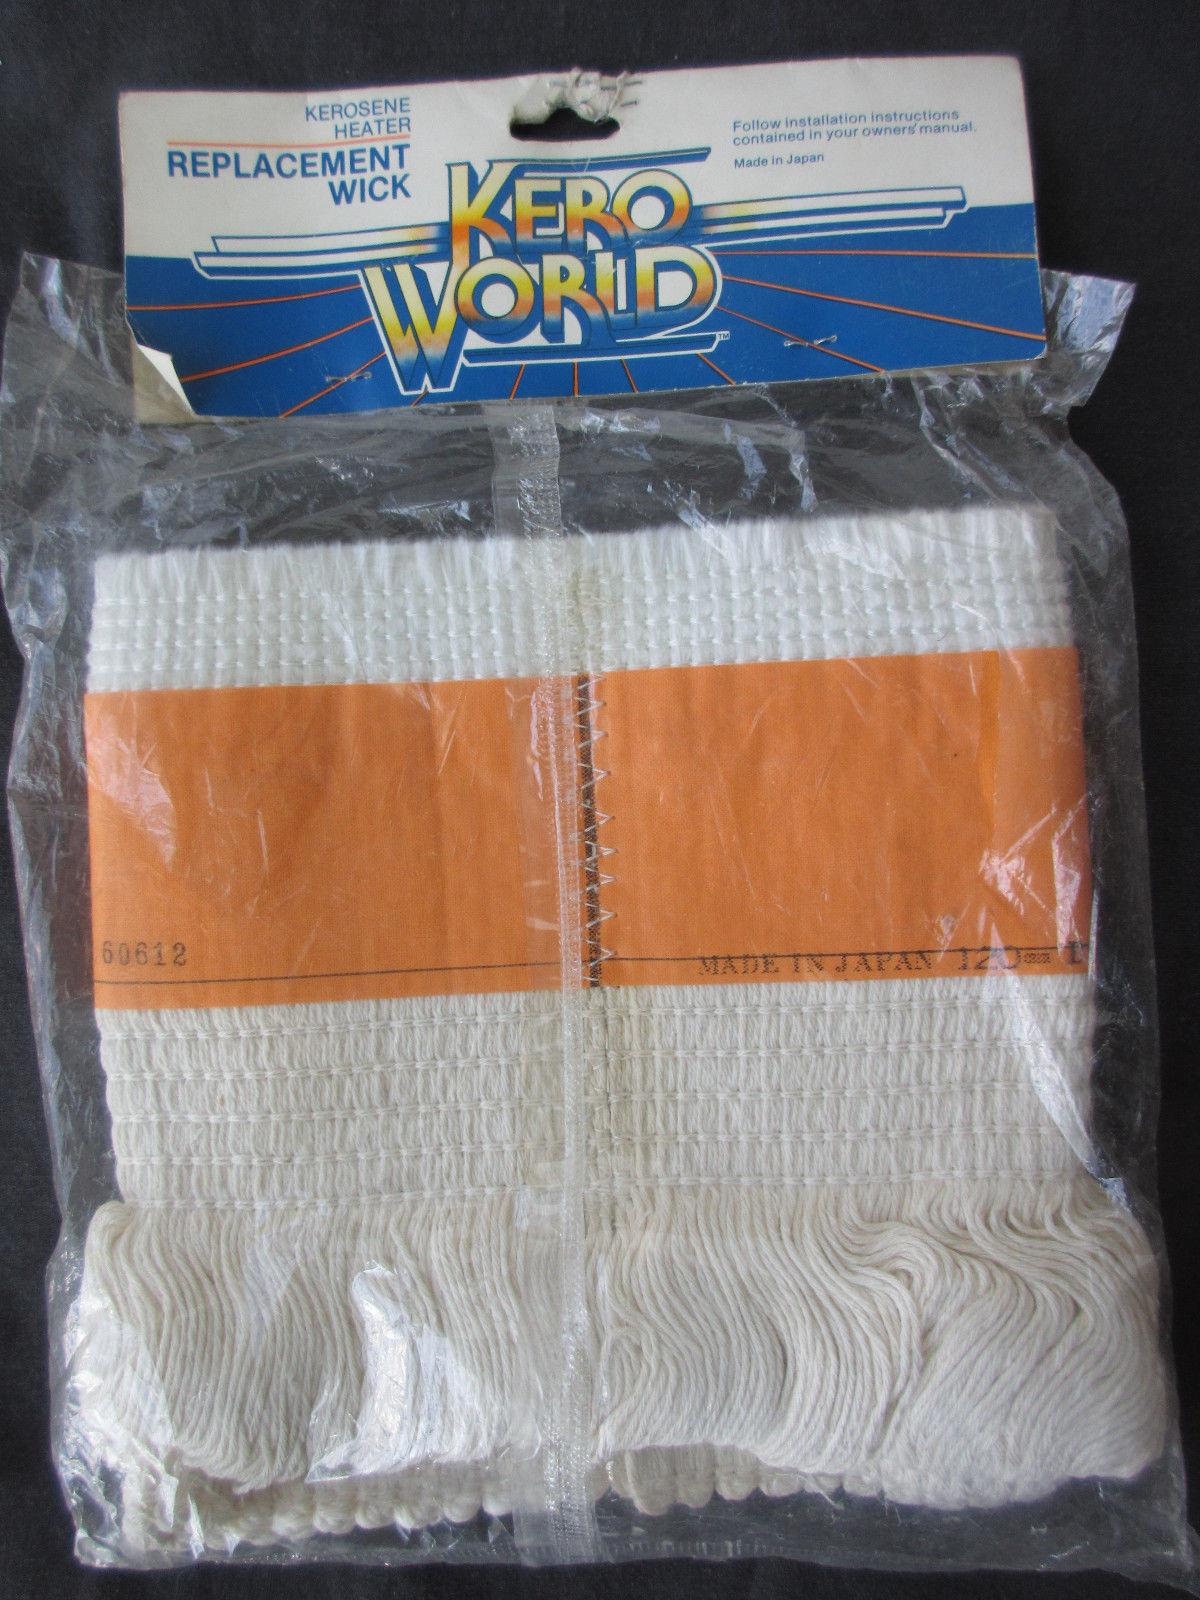 Kero World Kerosene Heater OEM Replacement Wick 11005 Japan NOS